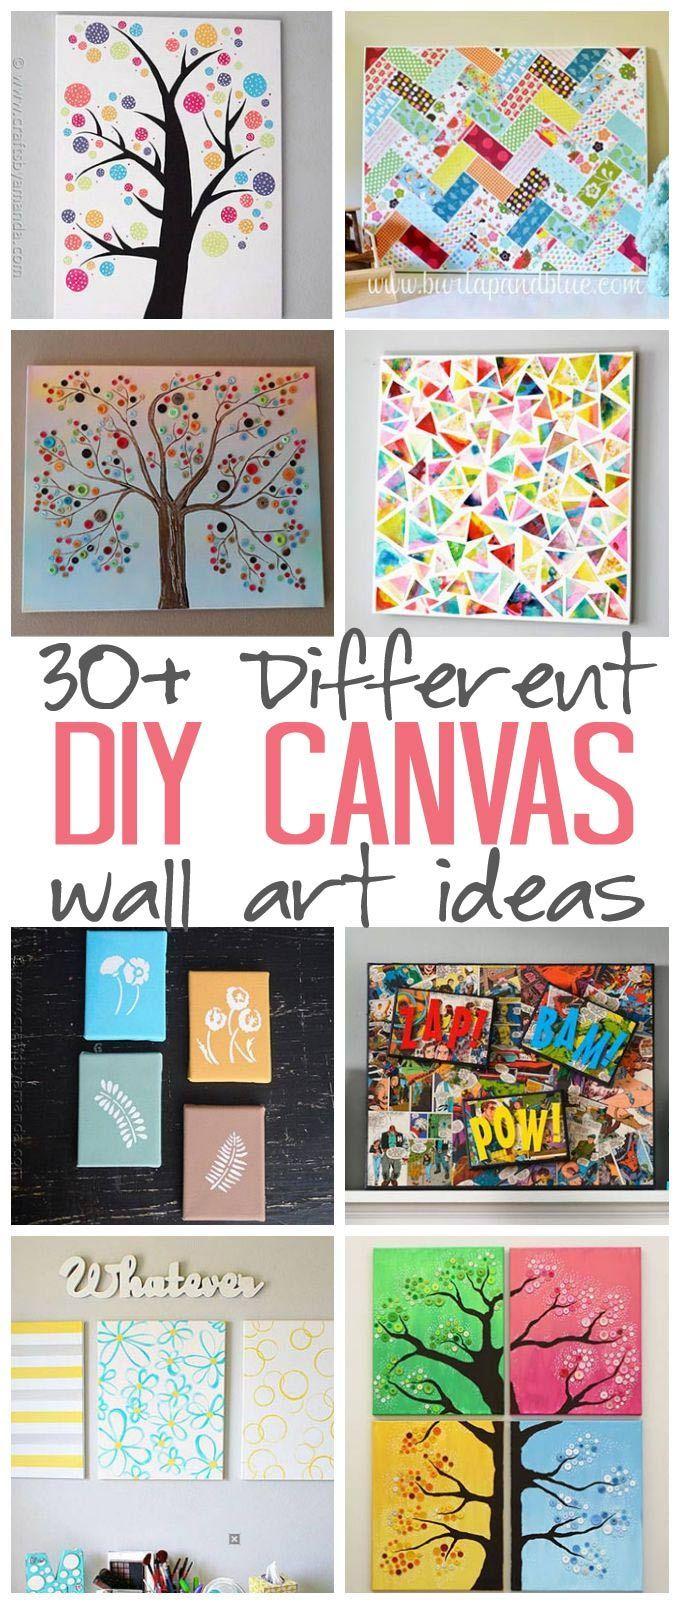 Diy canvas wall art ideas canvas tutorials for adults great